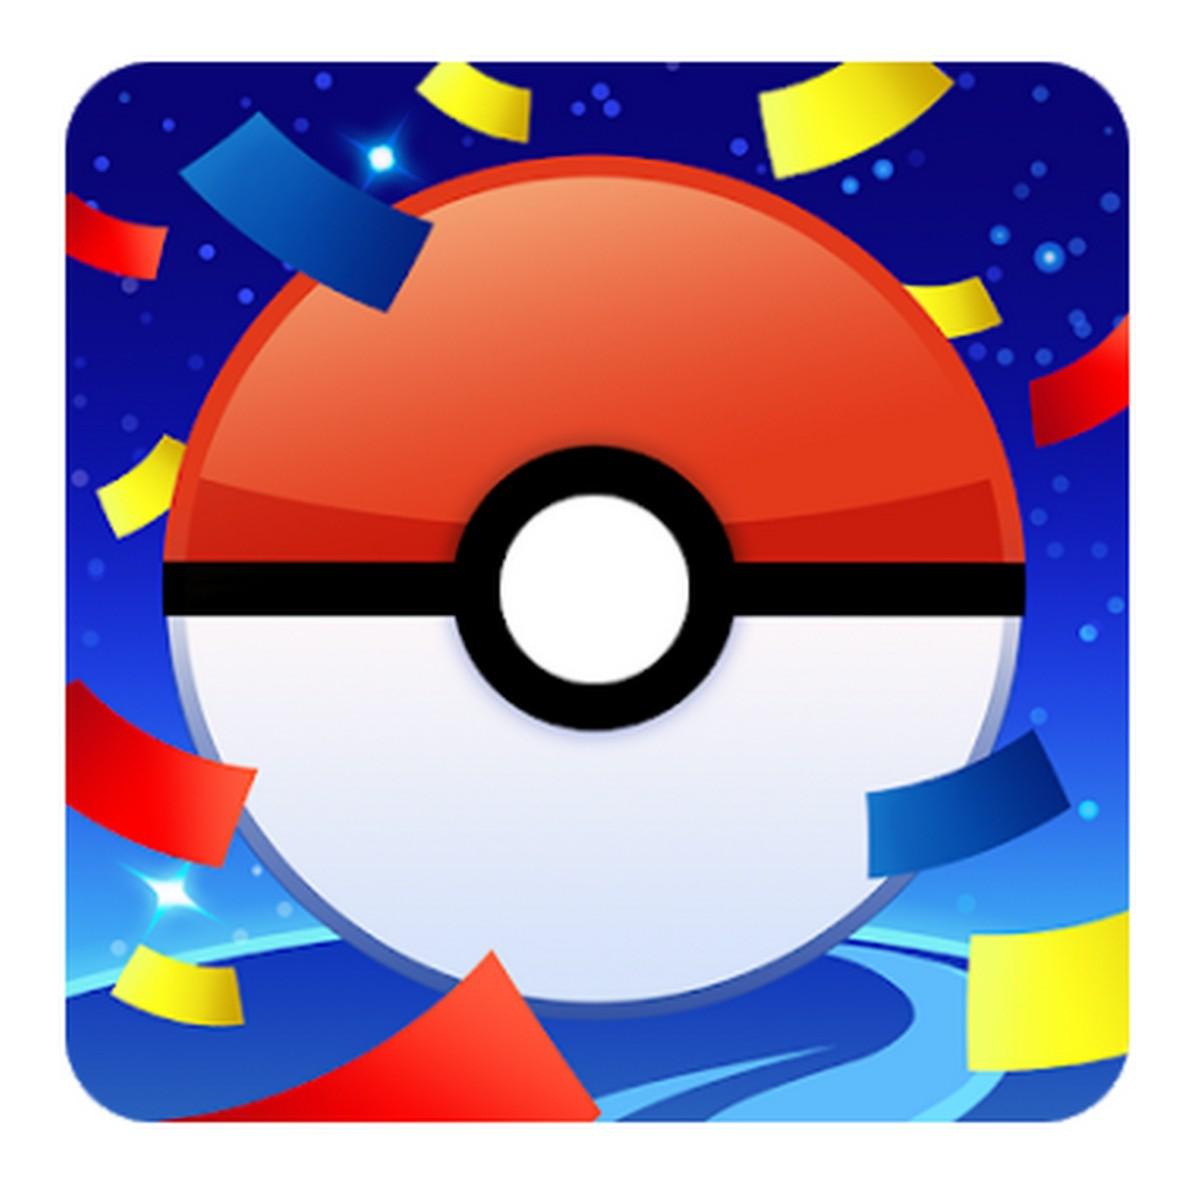 Pokémon GO for Android